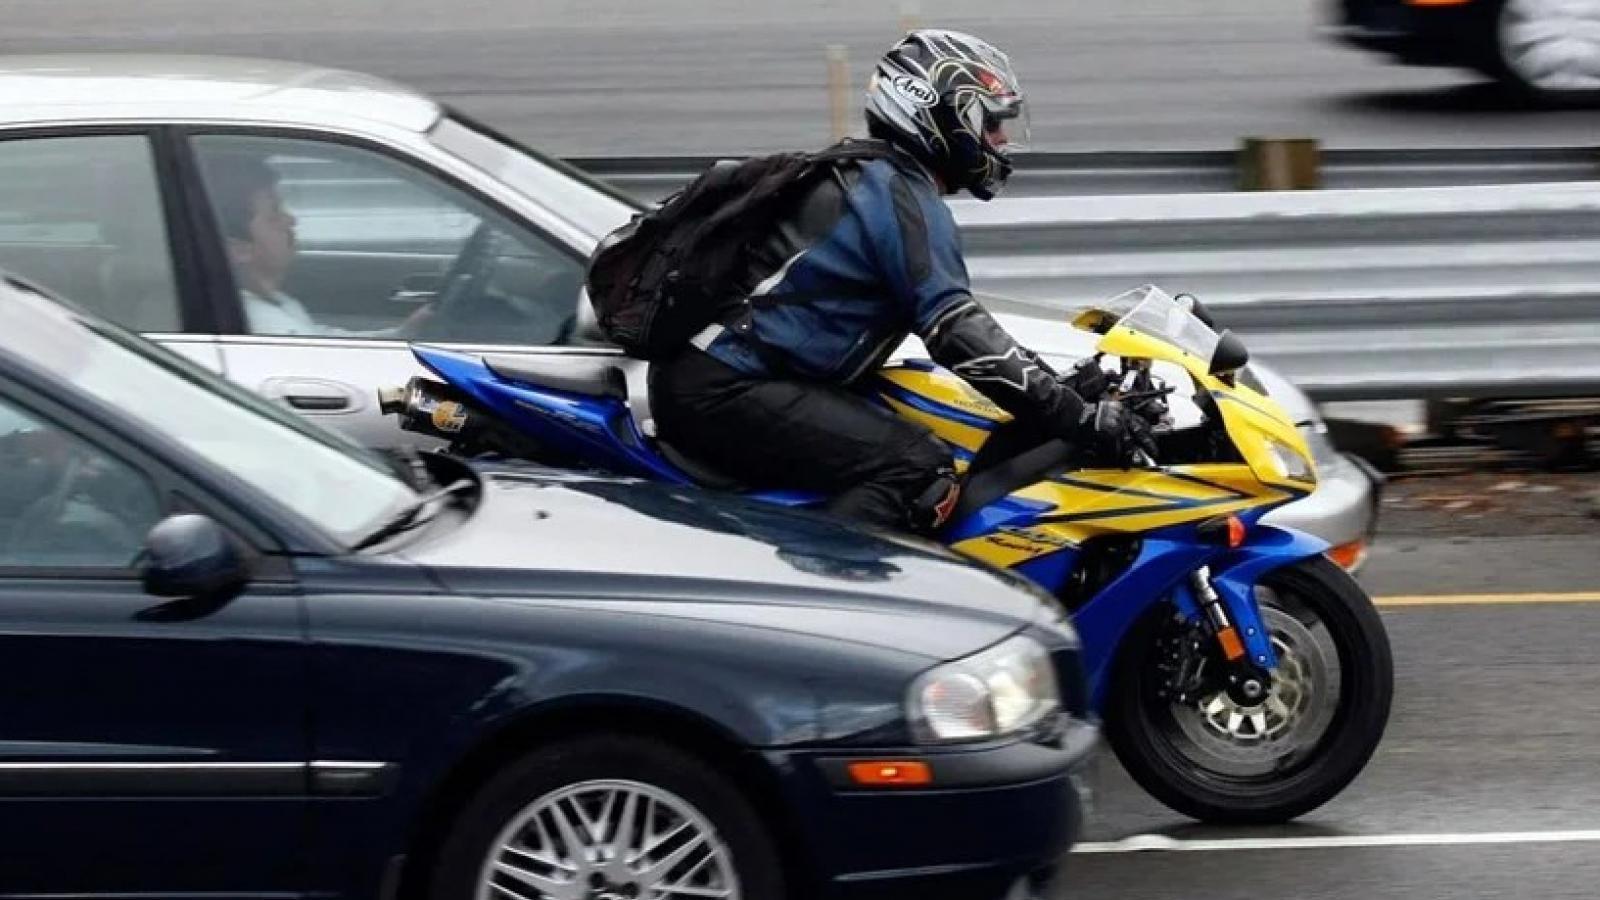 Мотоциклистам запретят езду между рядами?